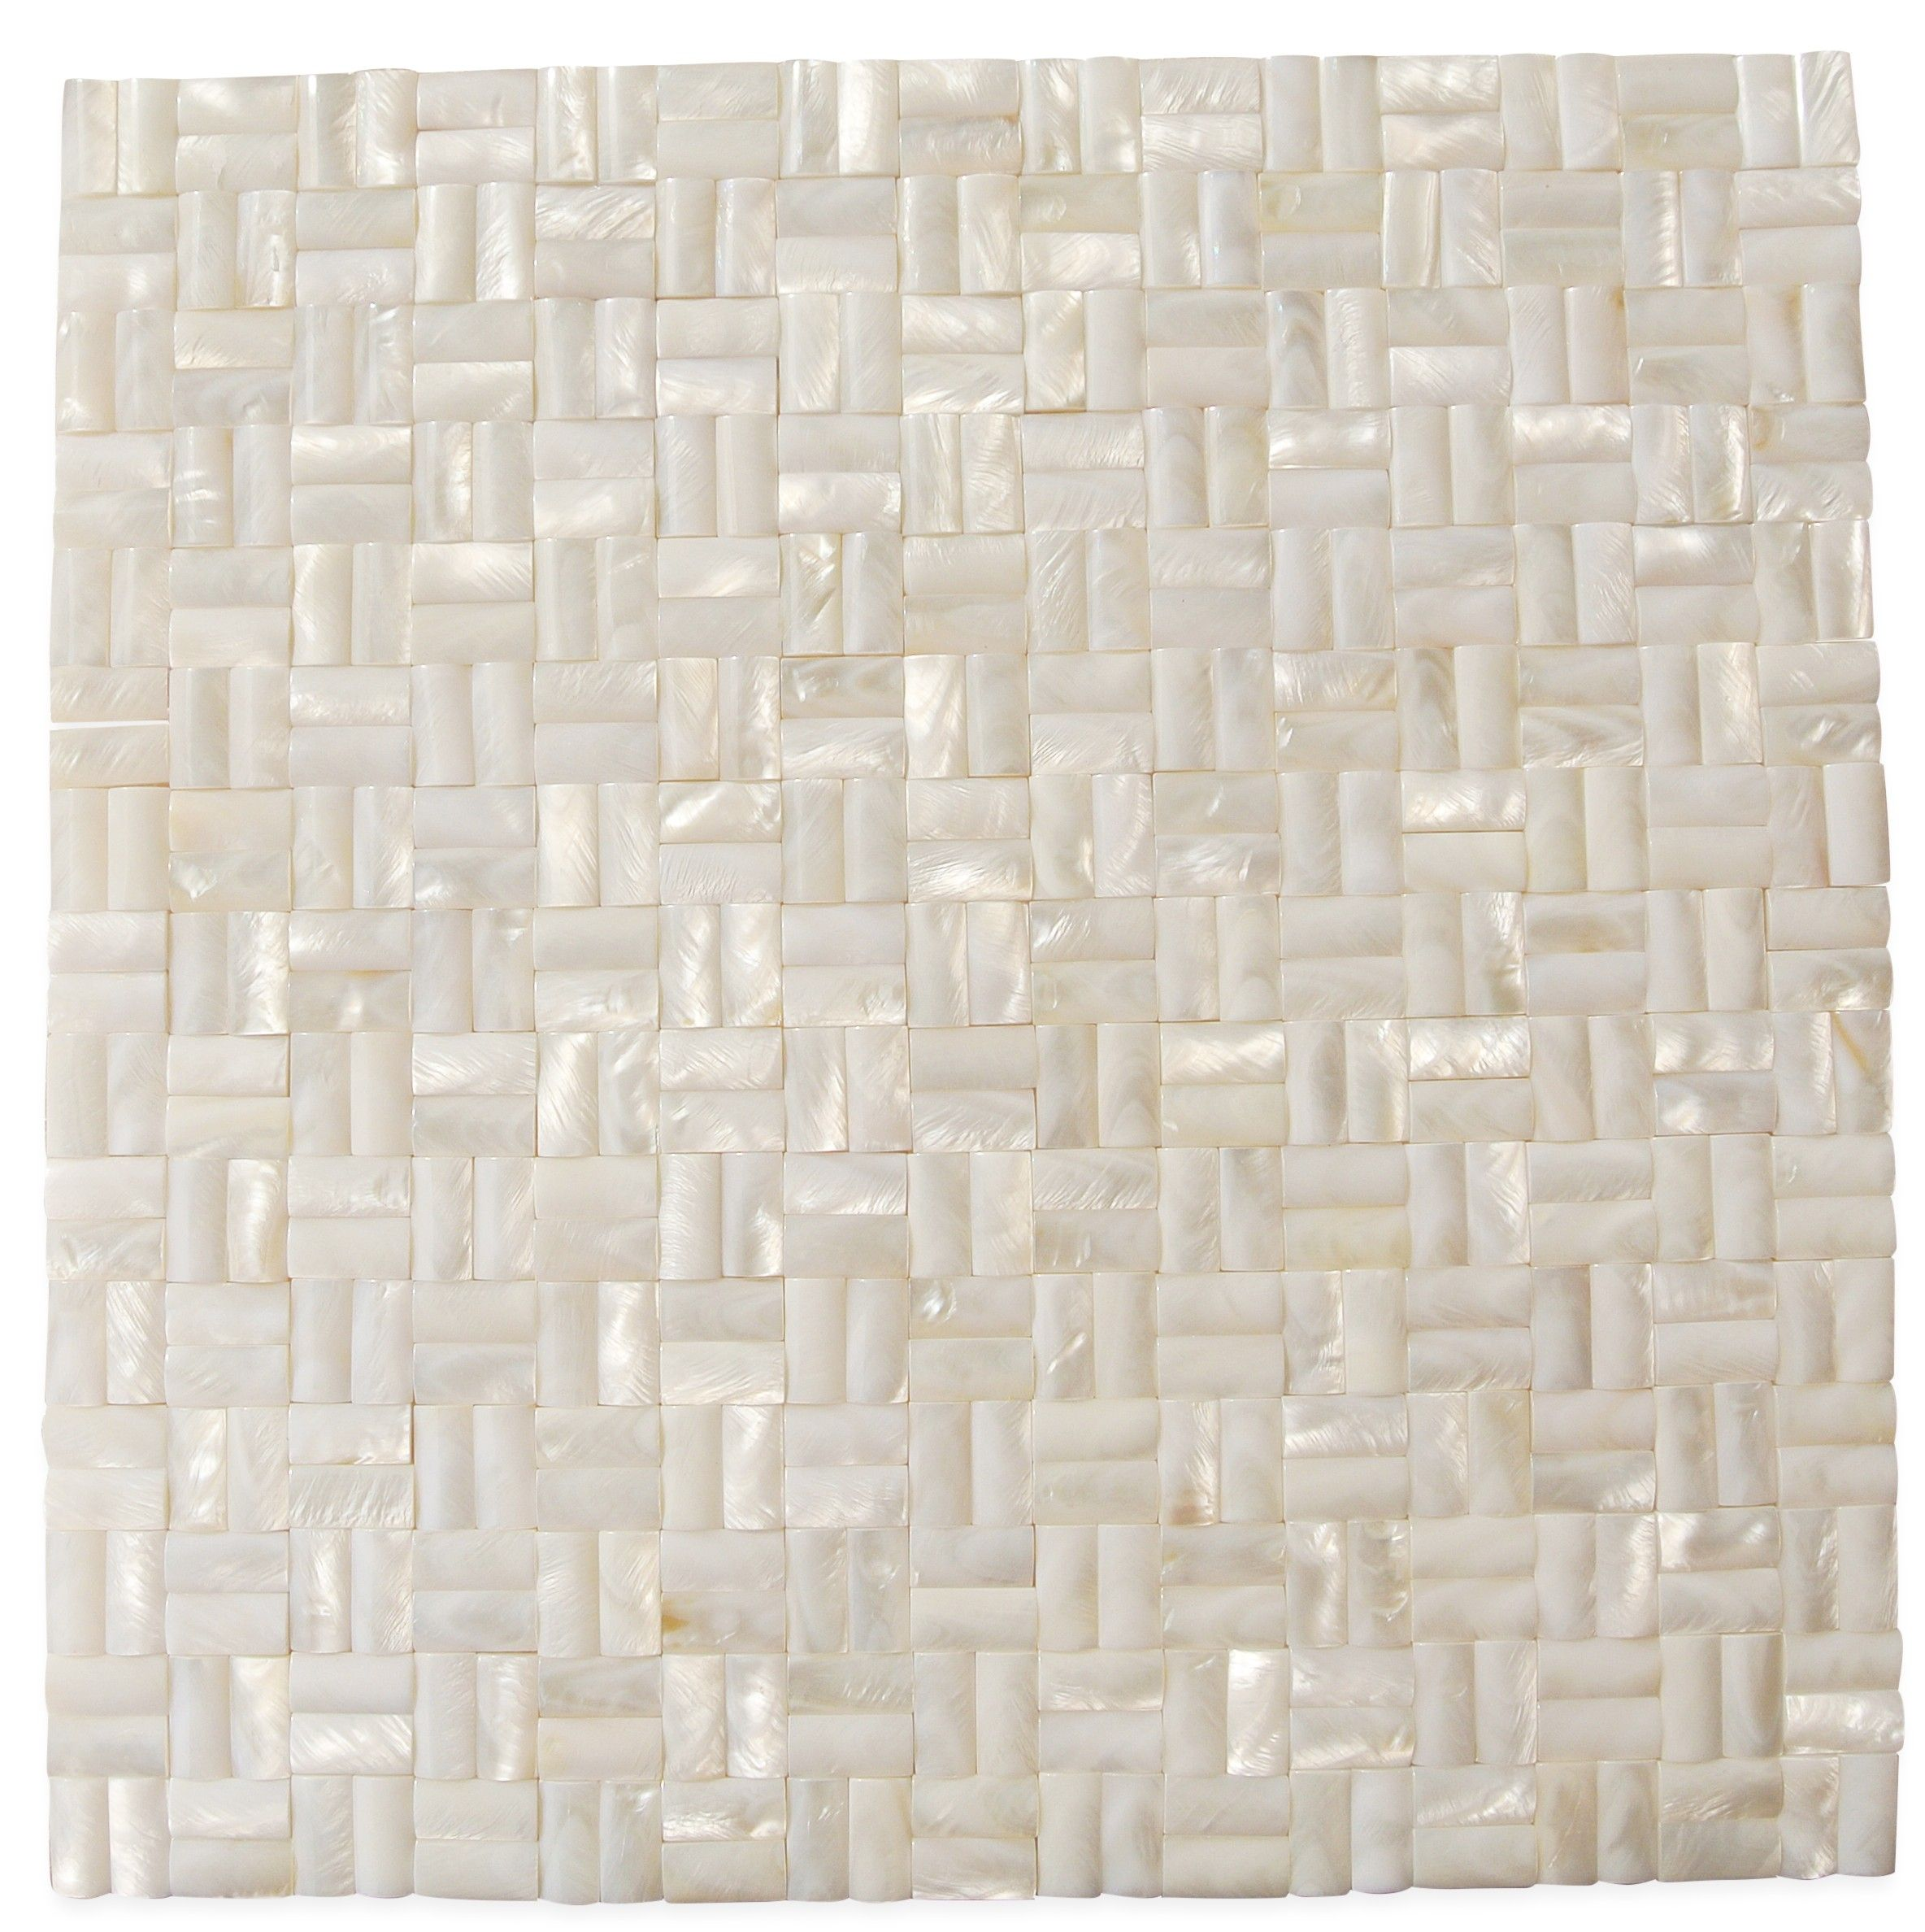 Splashback tile mother of pearl serene white in  mm seamless shell glass mosaic also  wood stone tiles nz